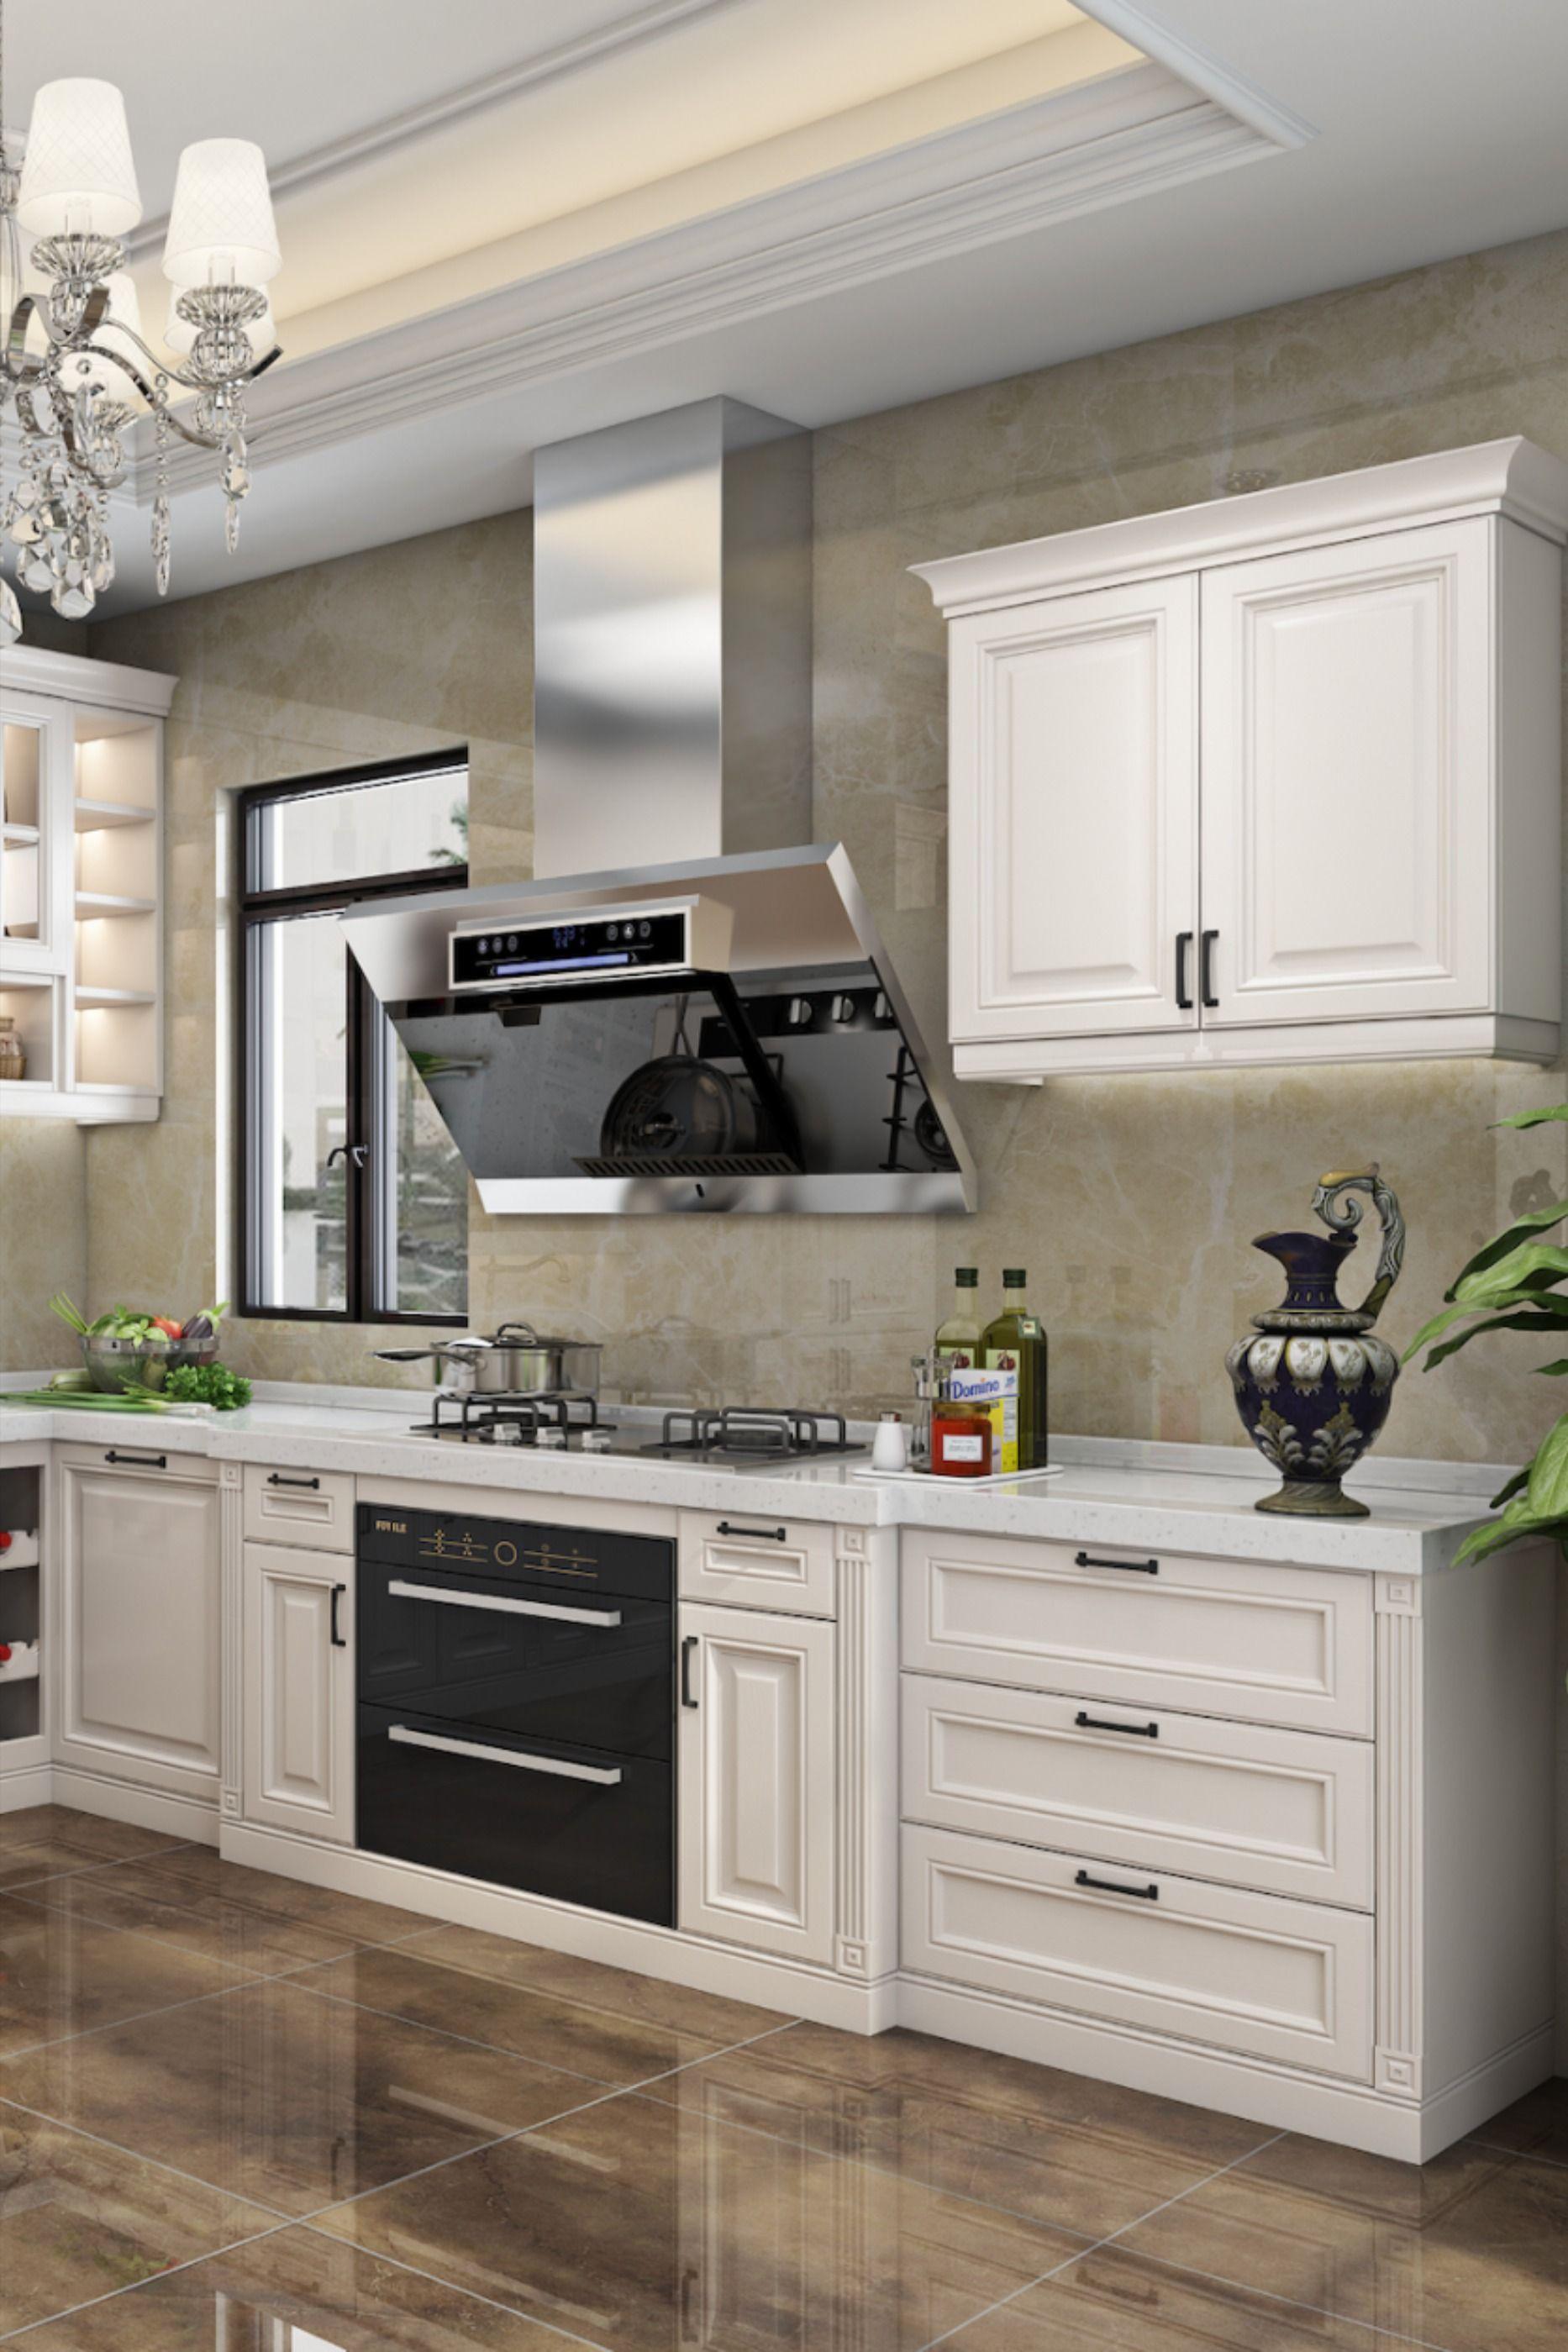 Pvc Blister Kitchen Cabinet Kitchen Cabinets Custom Kitchen Cabinets Wooden Kitchen Cabinets